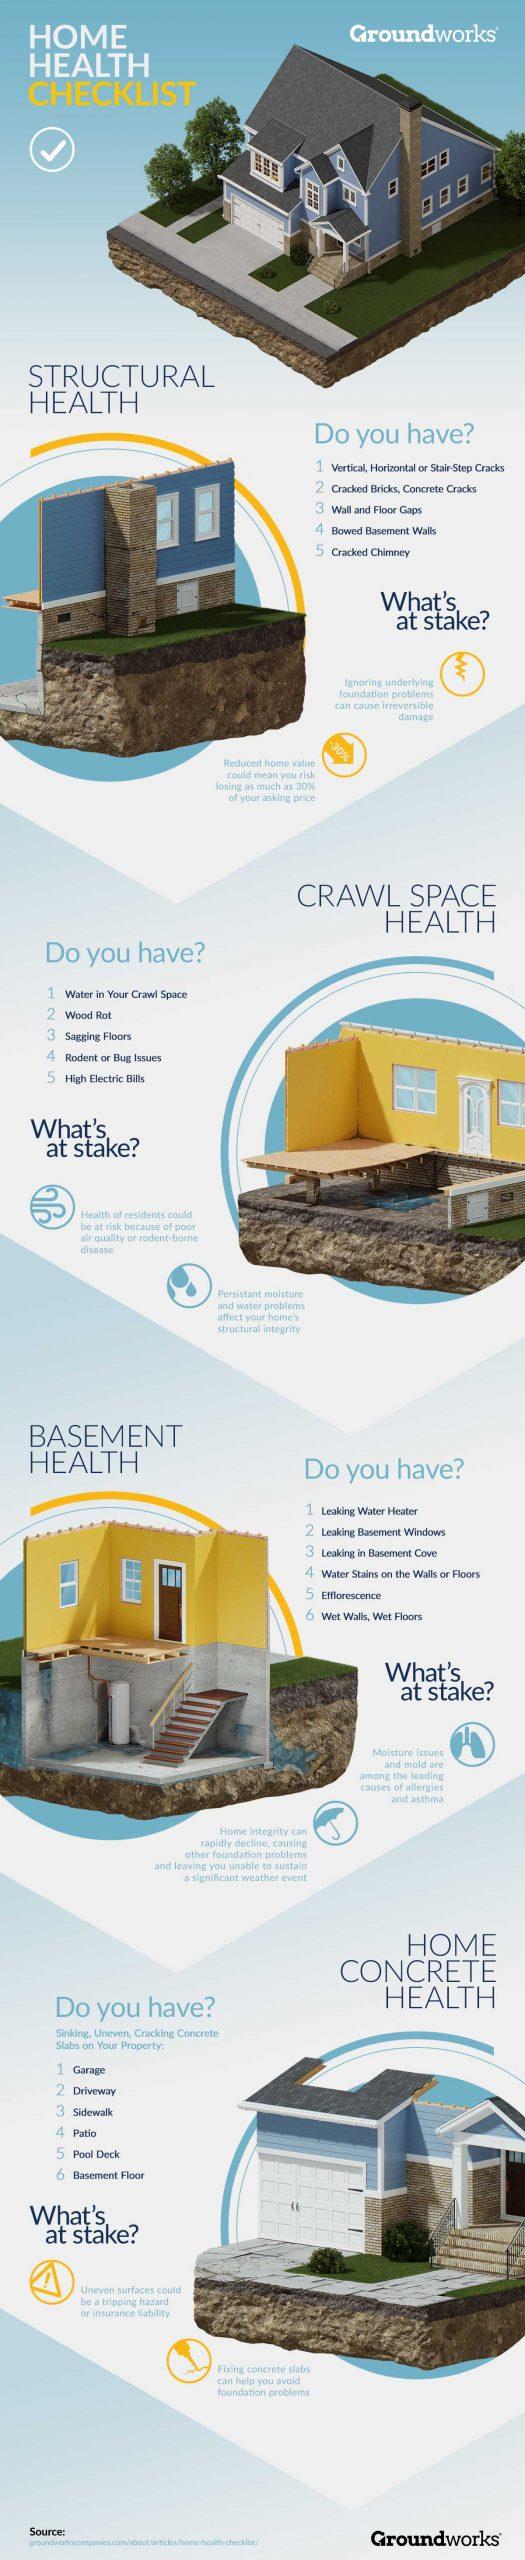 Home Health Checklist Infographic